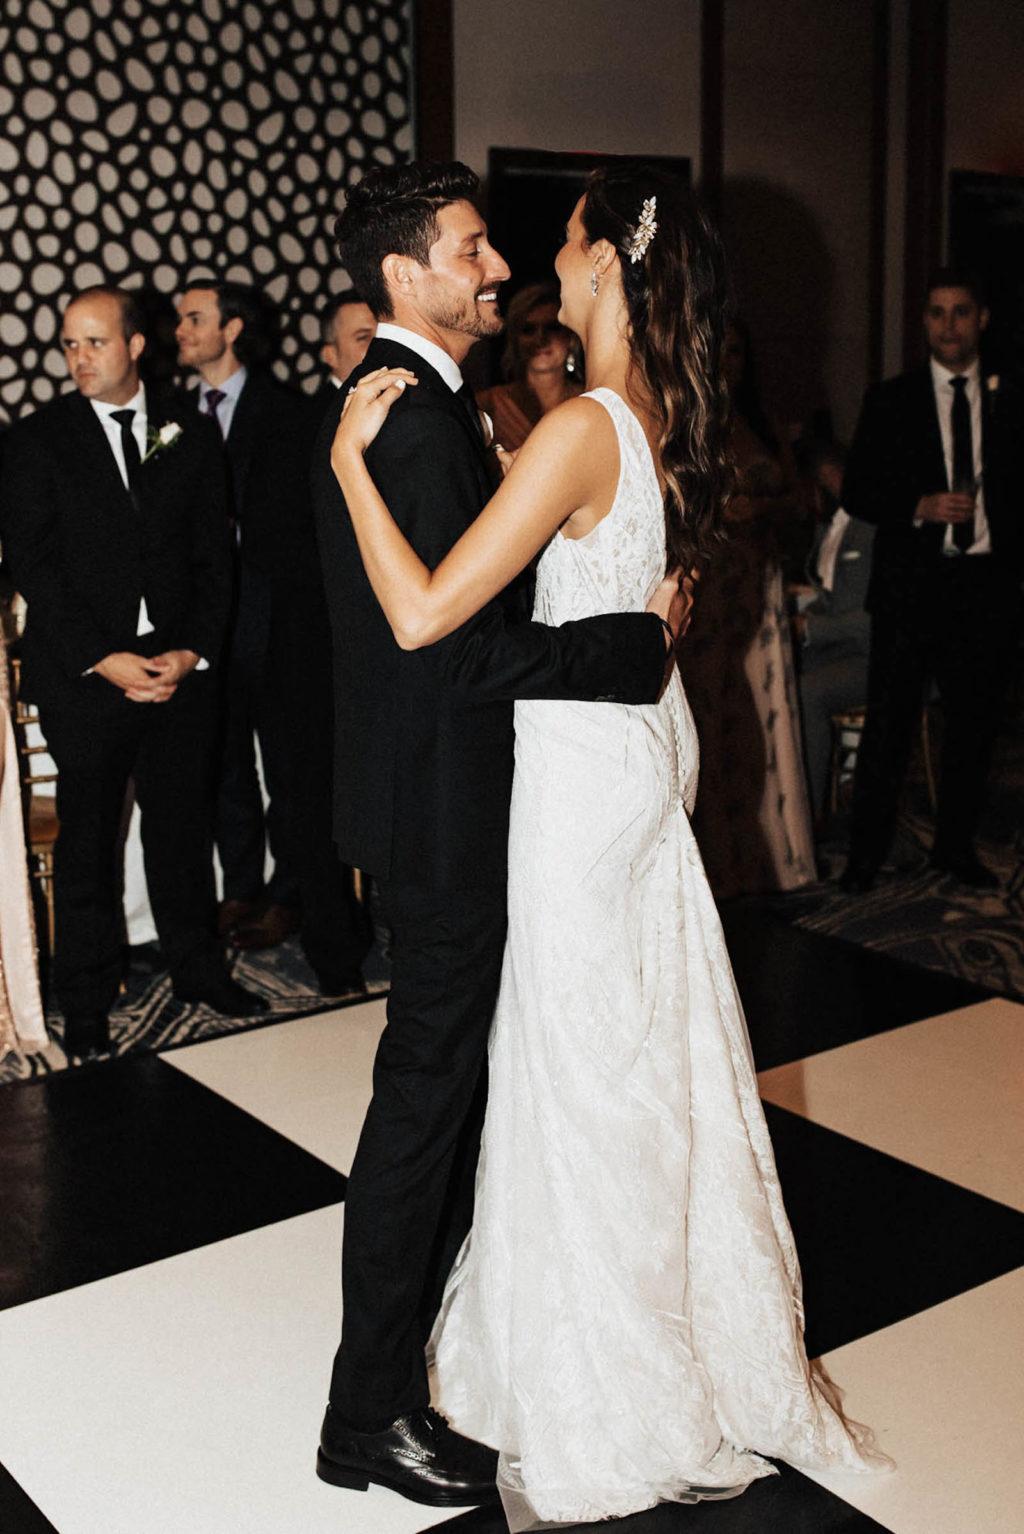 Bride and Groom First Dance Photo | Tampa Bay Wedding DJ Grant Hemond & Associates